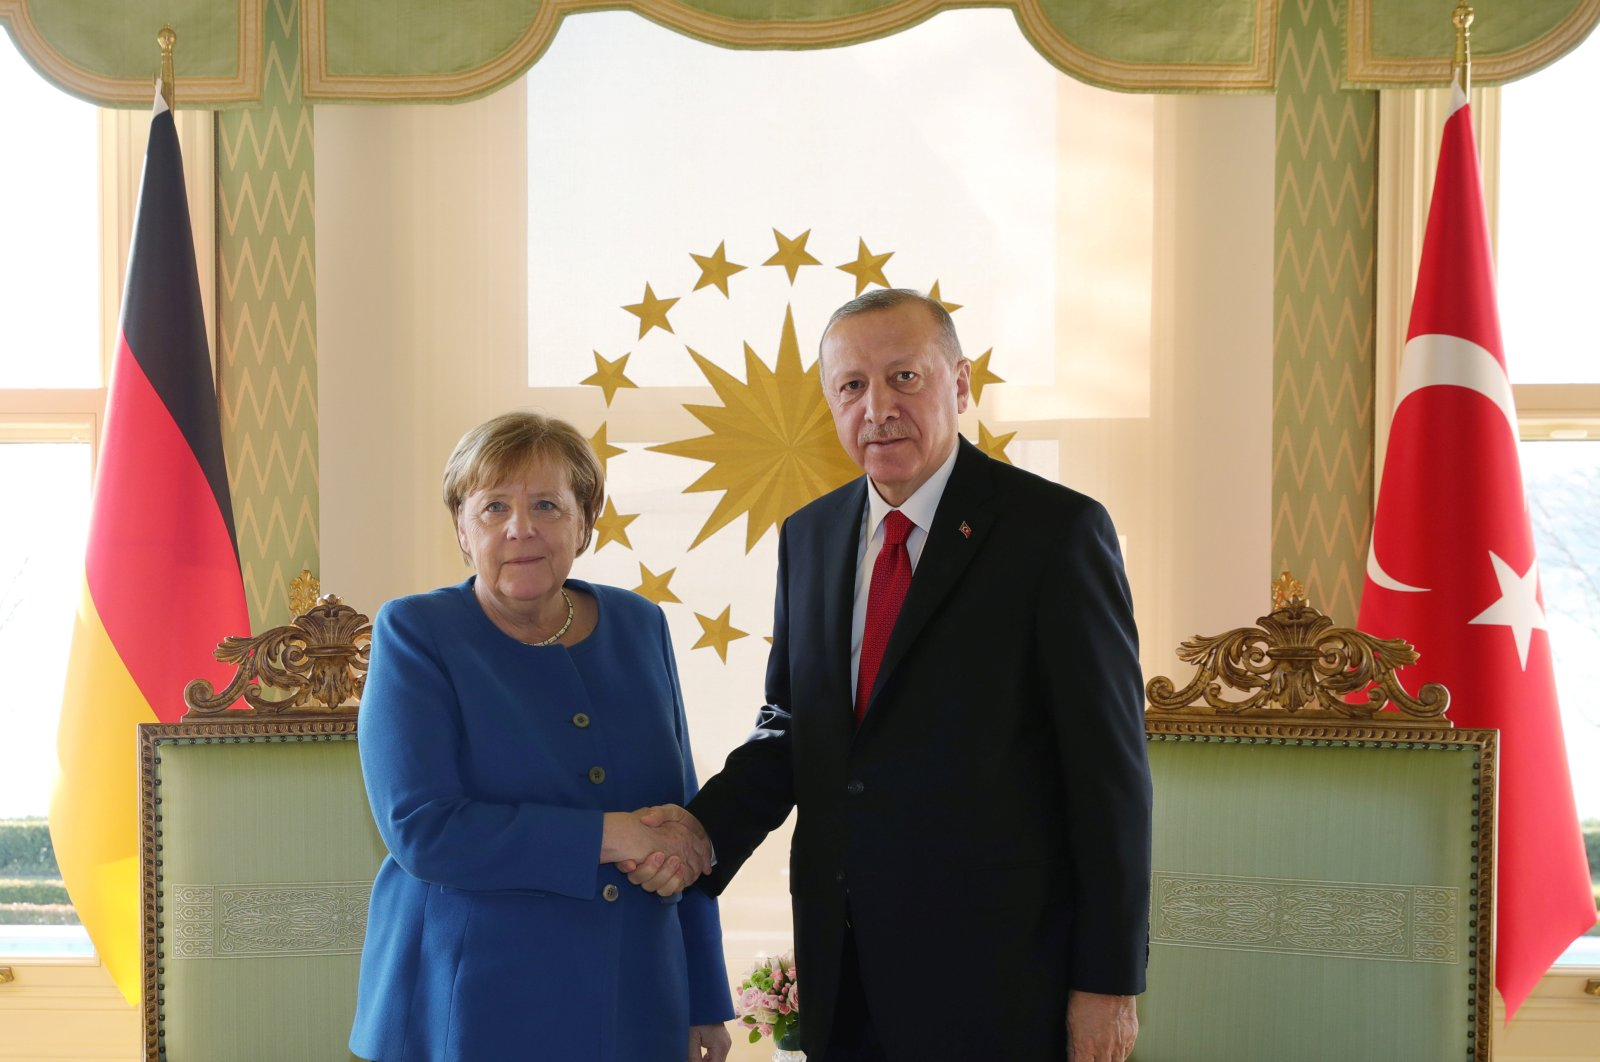 President Tayyip Erdoğan shakes hands with German Chancellor Angela Merkel during their meeting in Istanbul, Turkey, Jan. 24, 2020. (Presidential Press Office/Handout via Reuters)